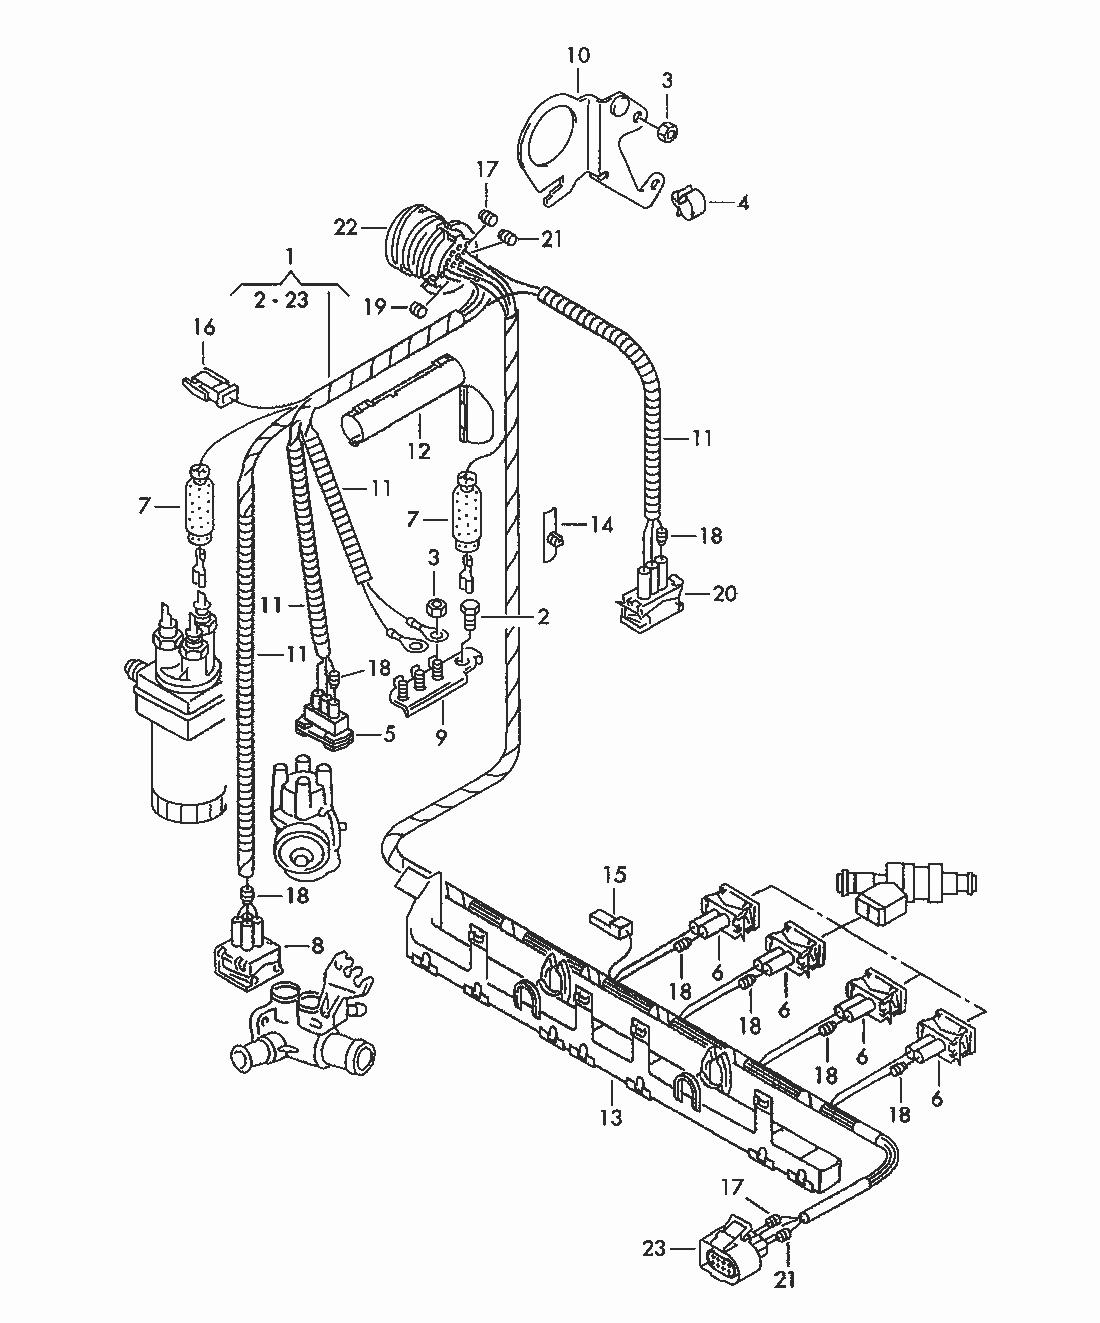 mk3 golf wiring diagram